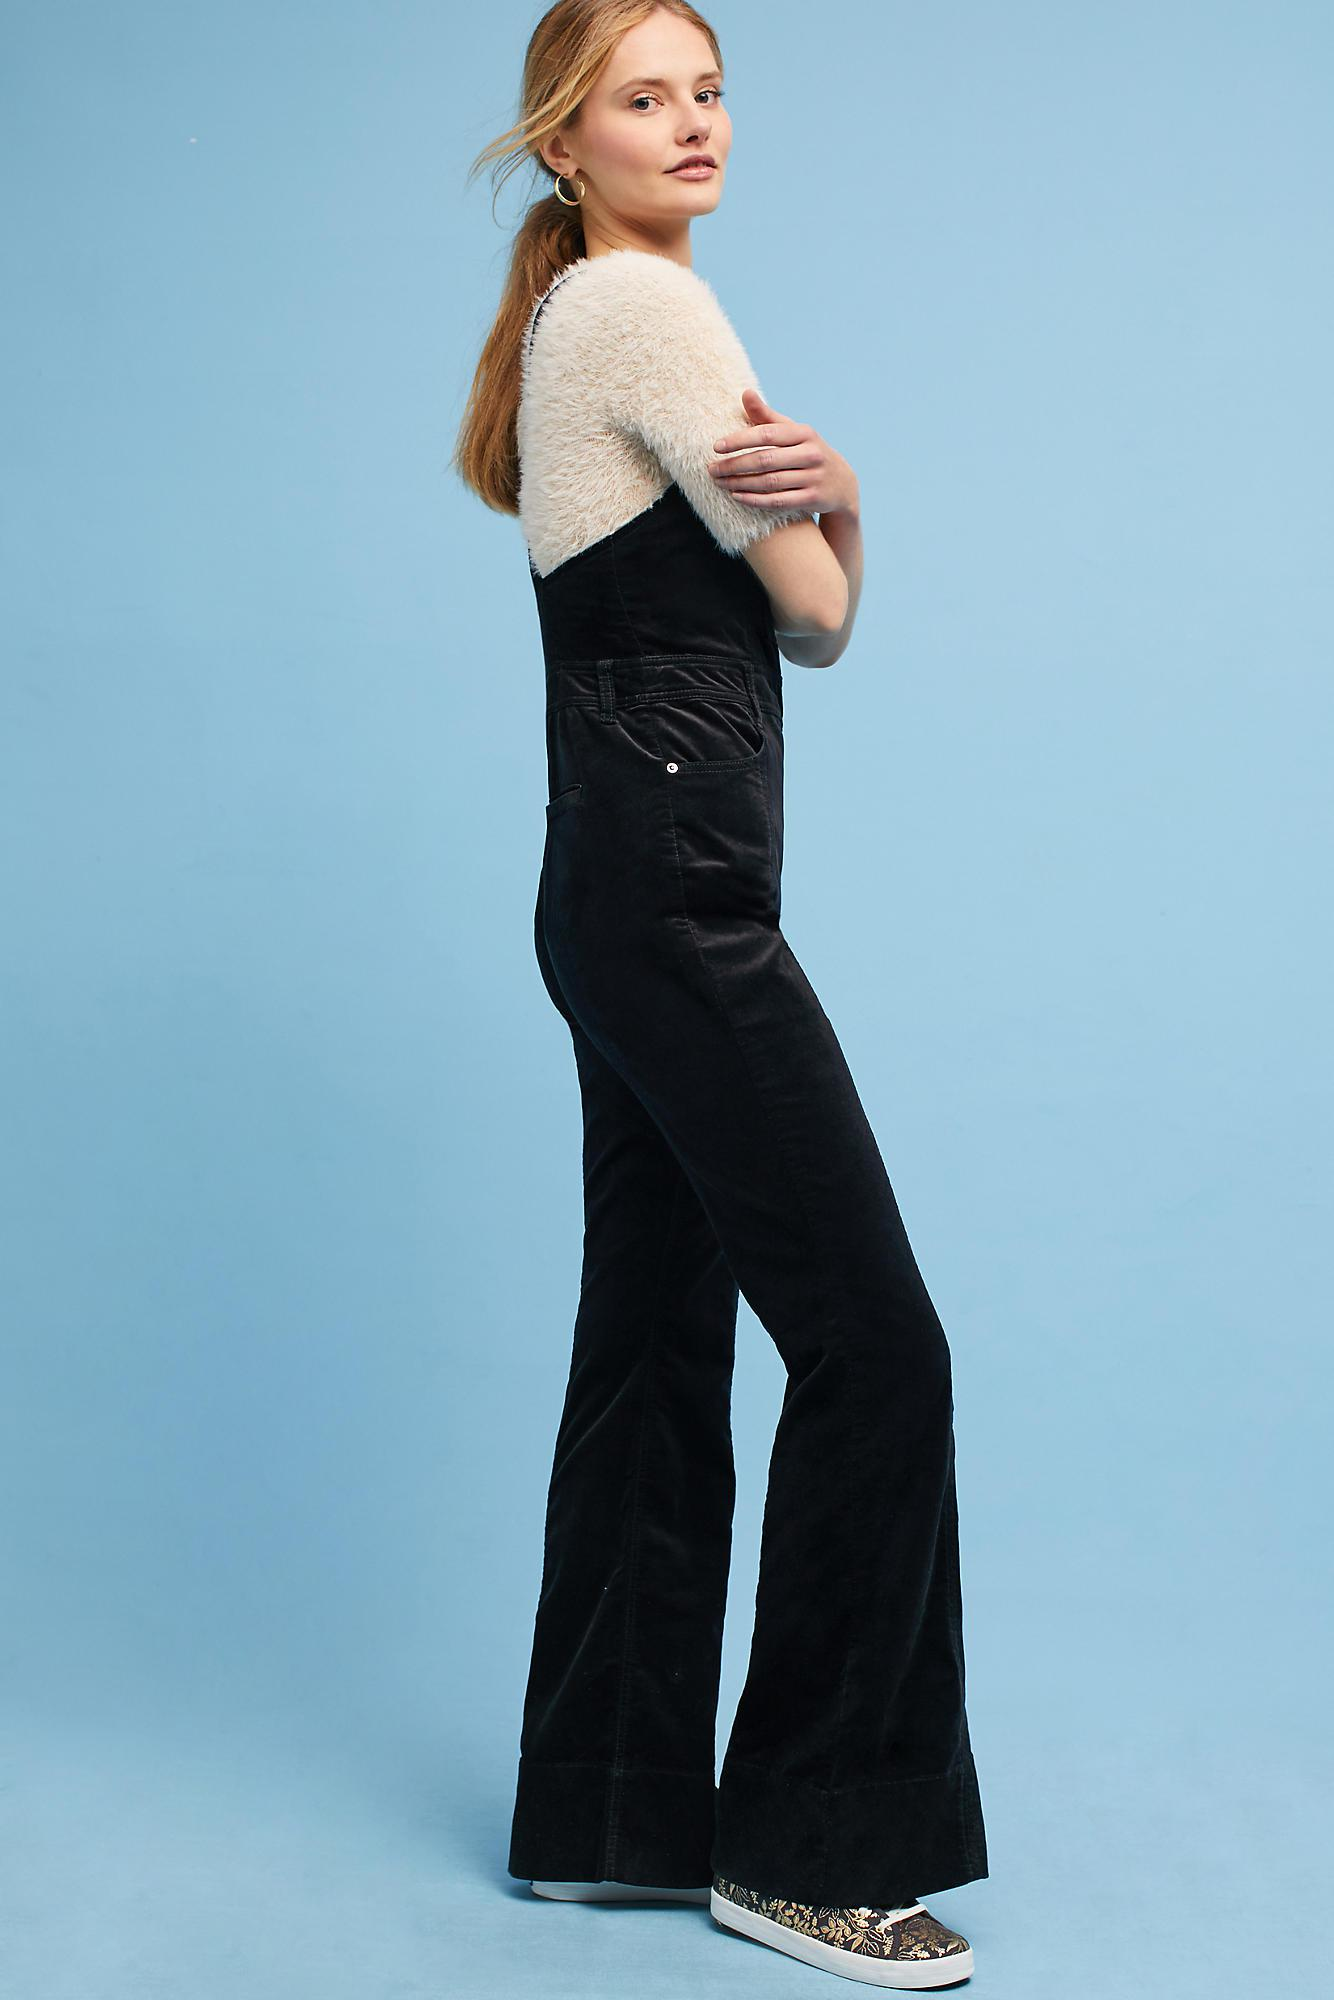 284359ab18a5 Anthropologie Julianne Velvet Jumpsuit in Black - Lyst